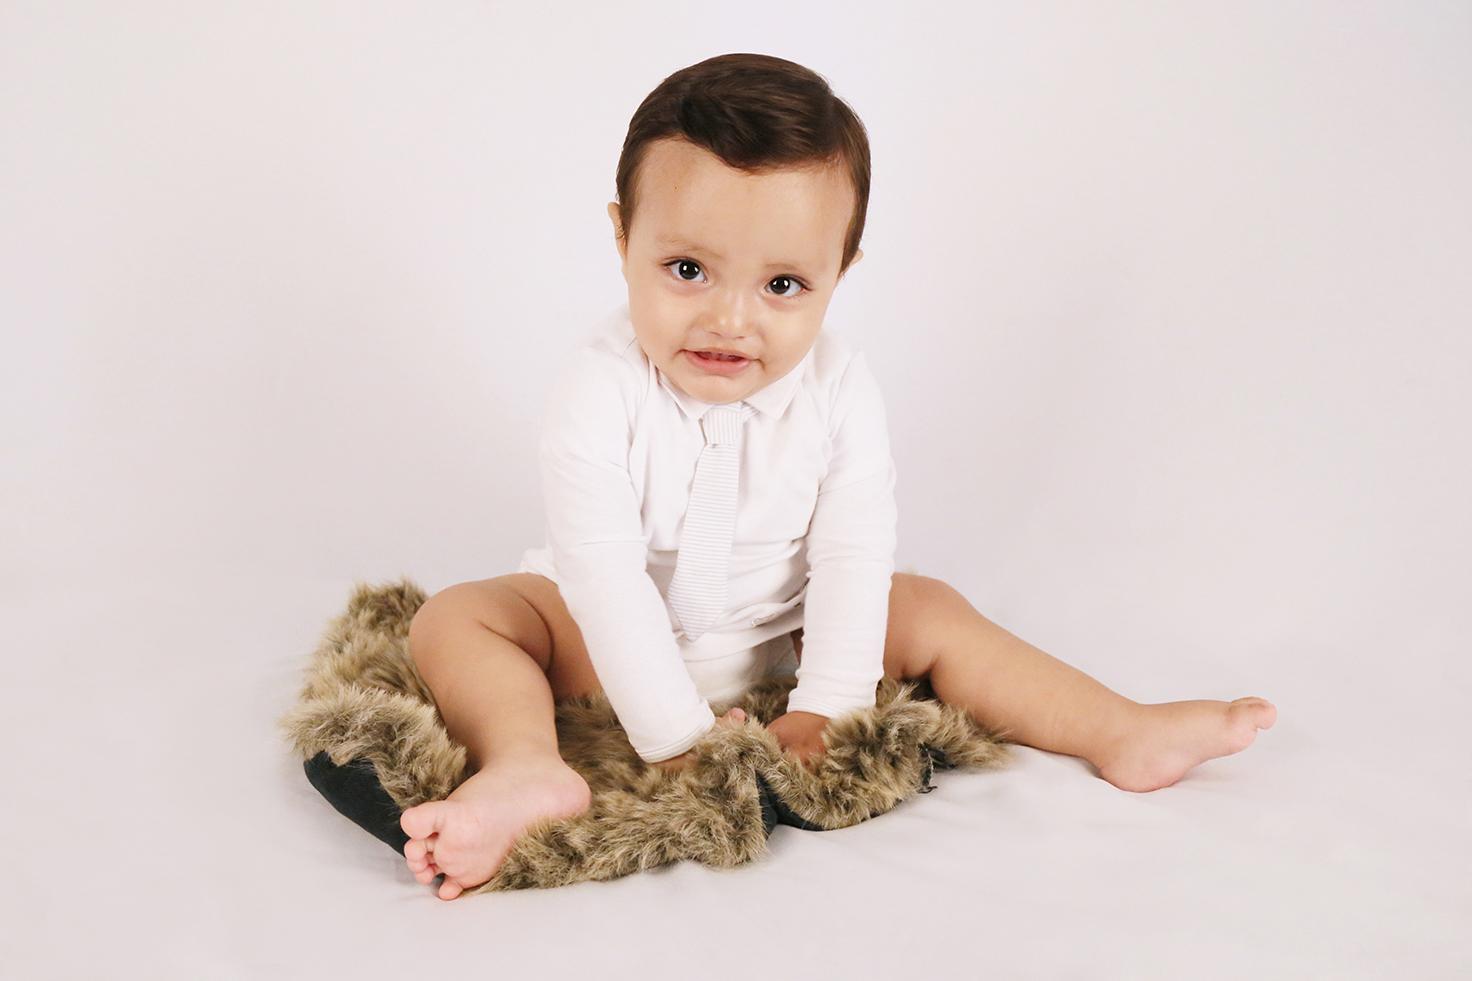 Maroge-Angela-Velazquez-fotografia-bebe-36